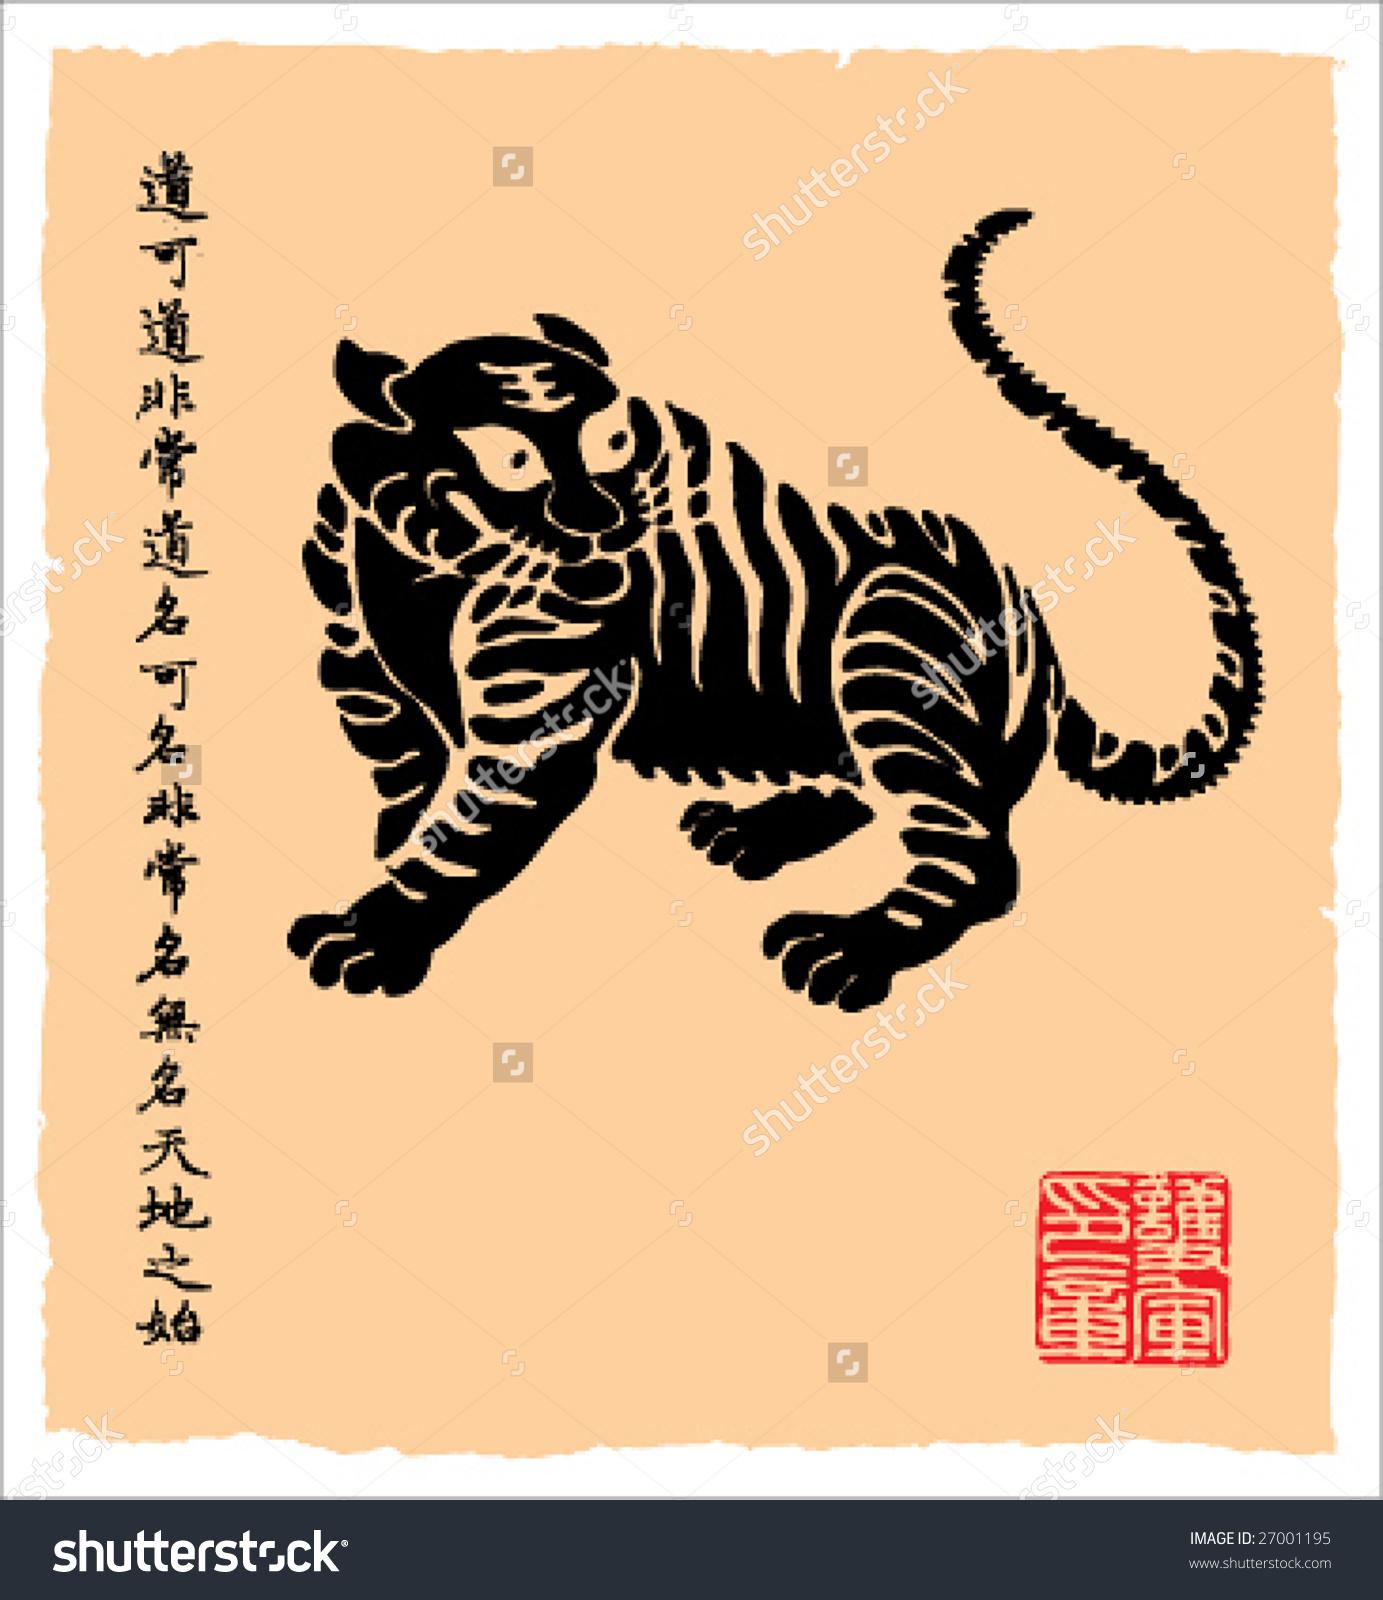 Tiger illustration photo